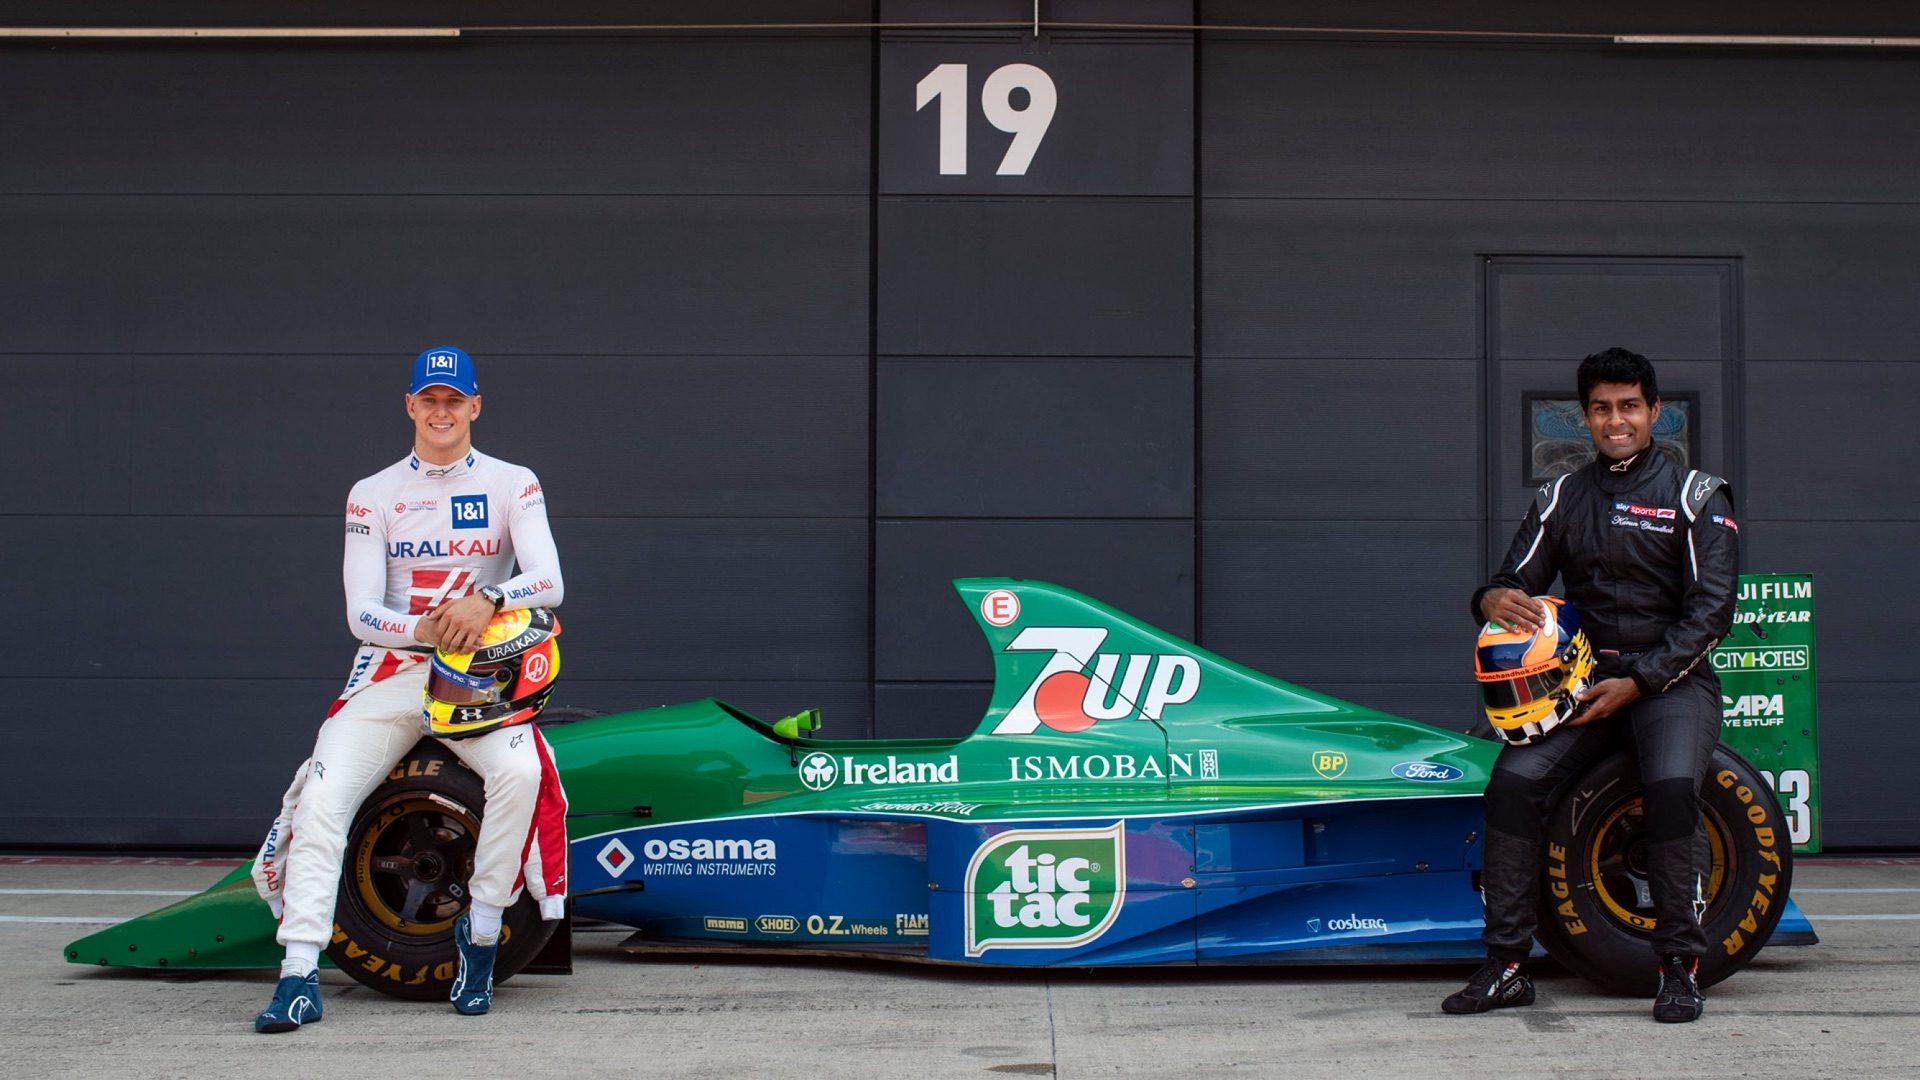 Mick_Schumacher_Jordan_191_Silverstone-0001